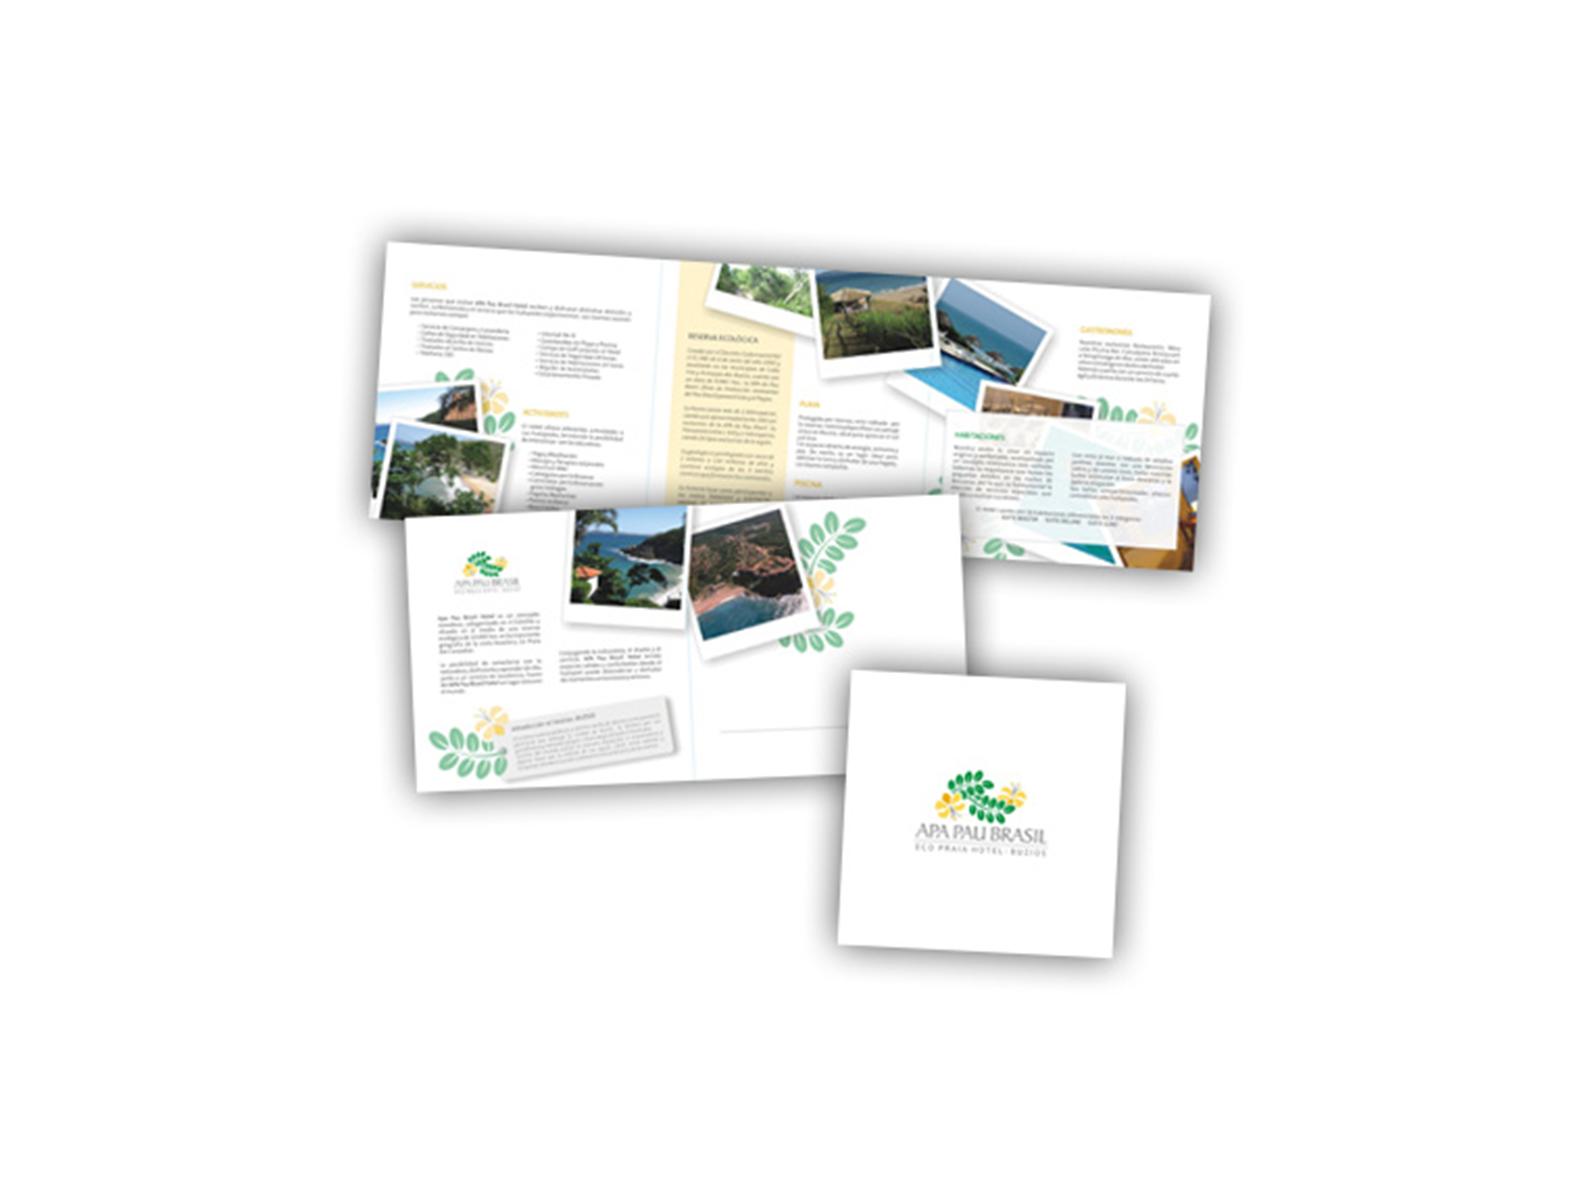 Apa Pau Brasil | Brochure